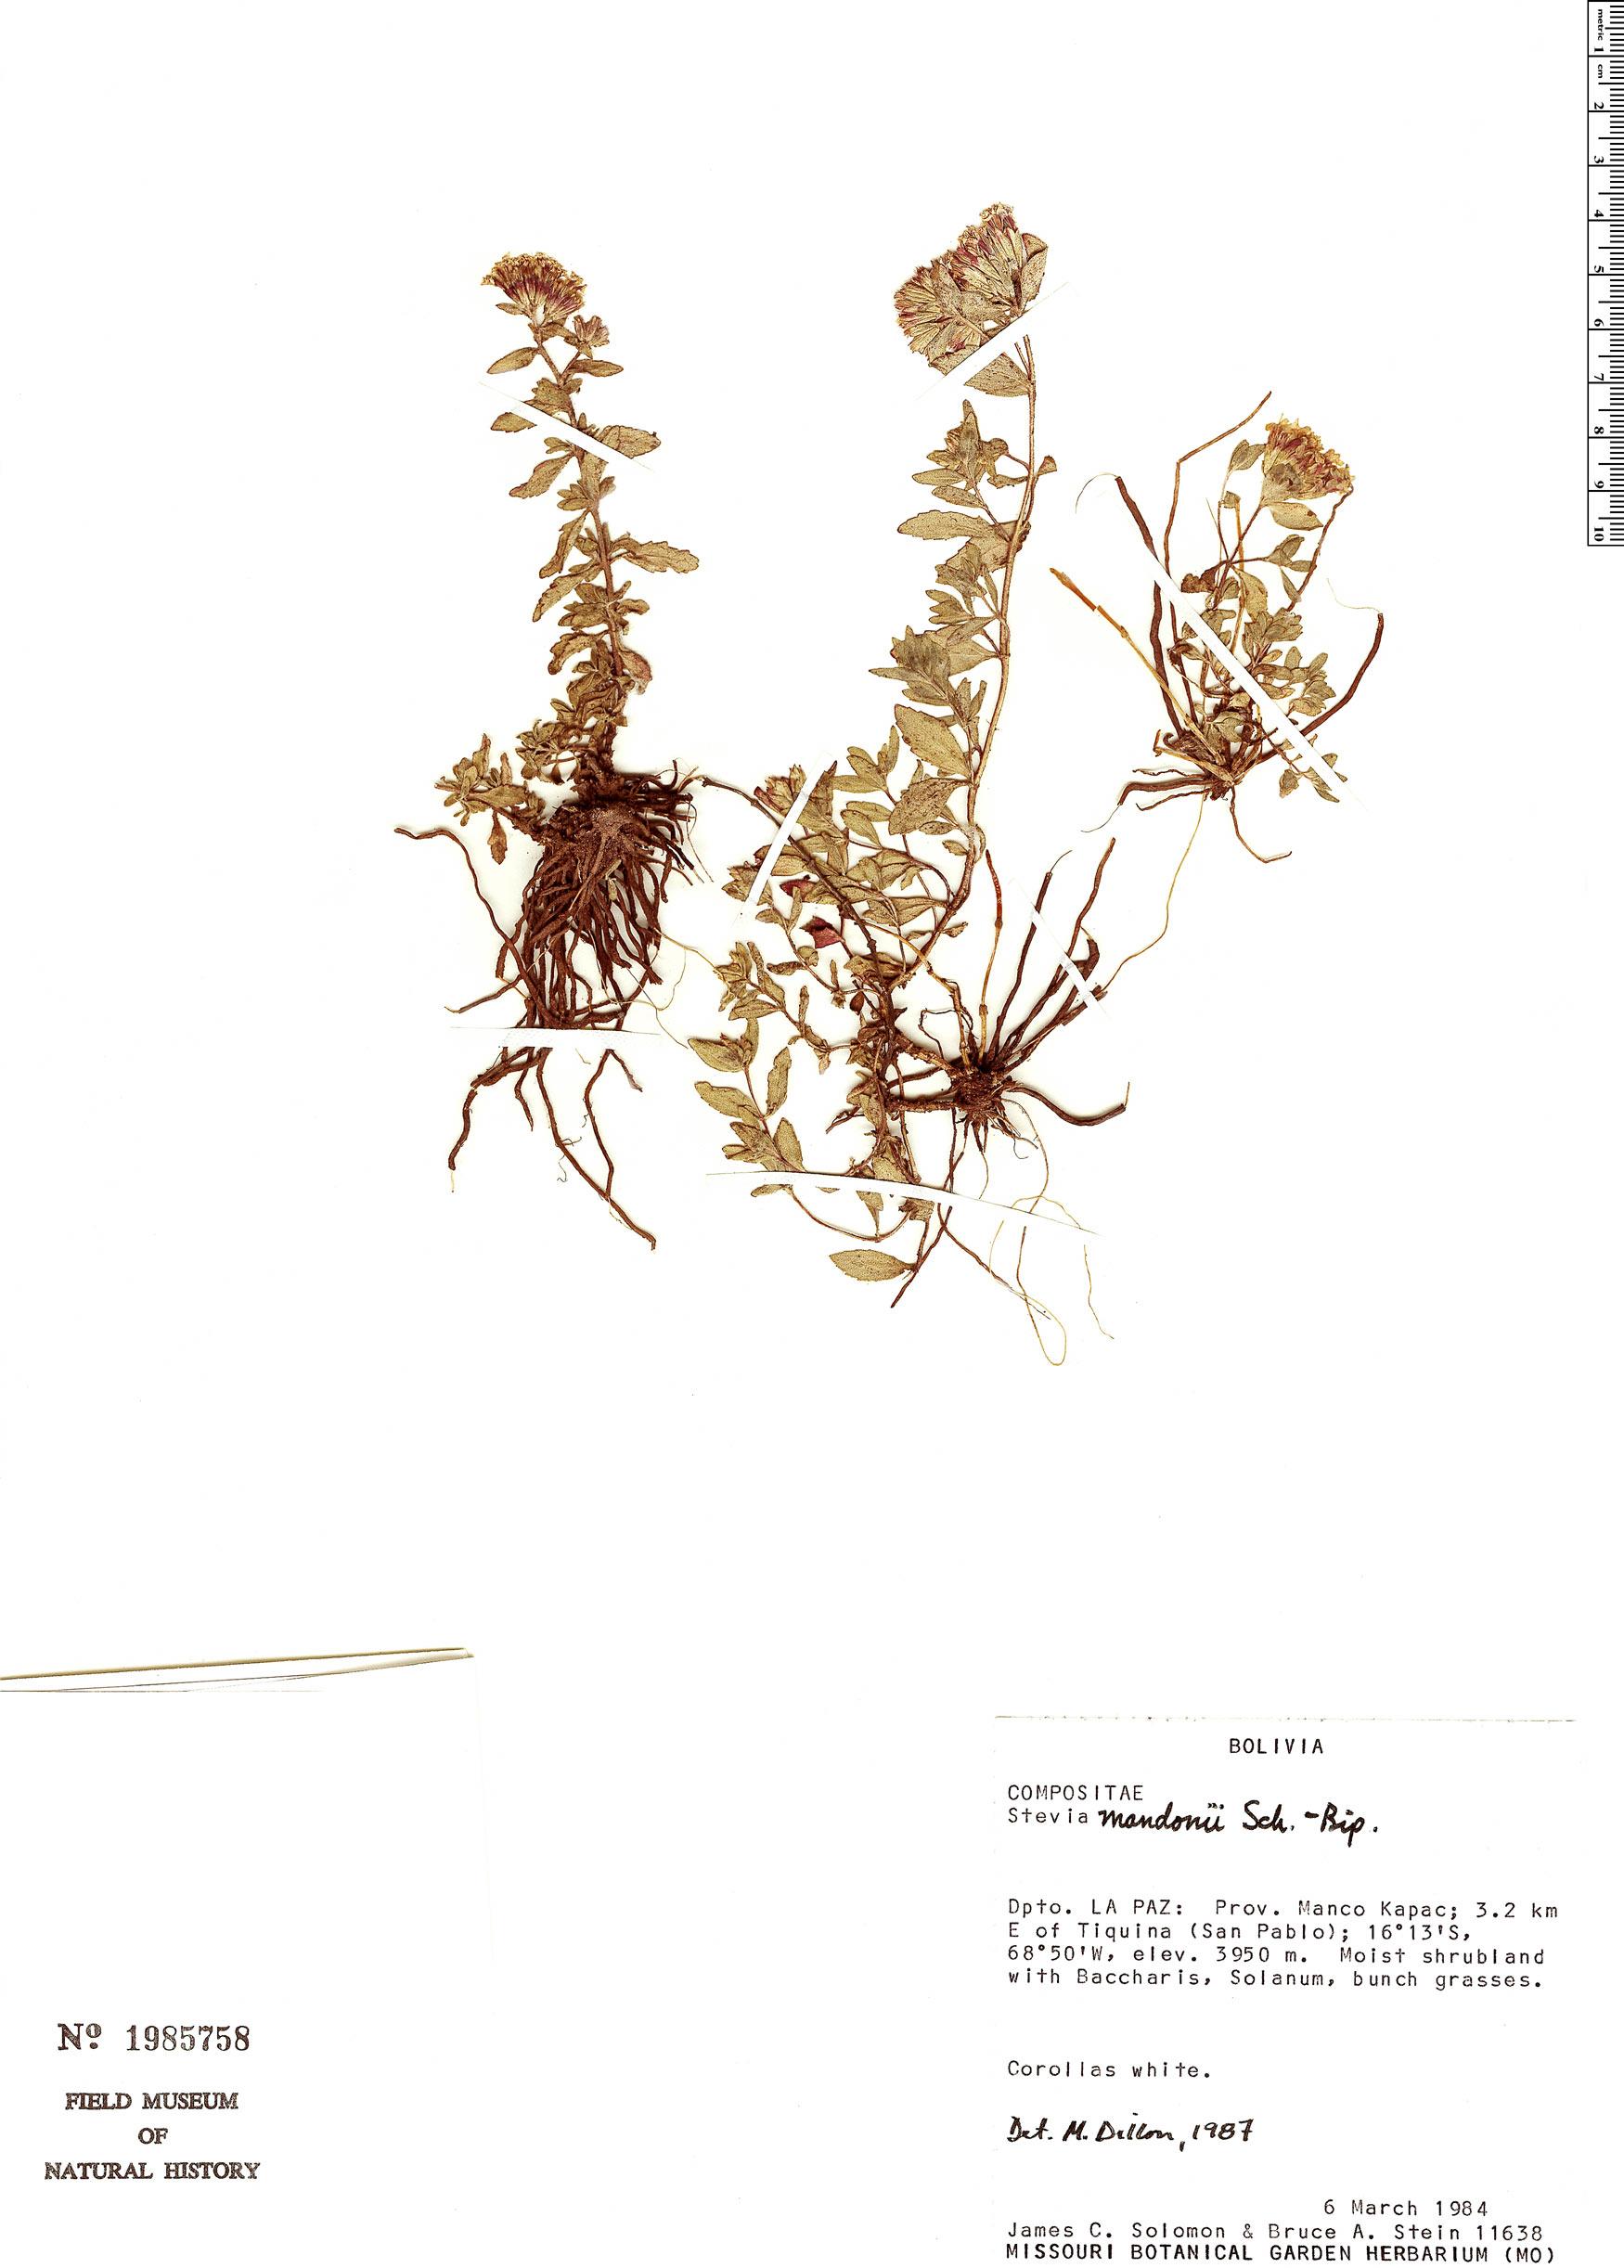 Specimen: Stevia mandonii